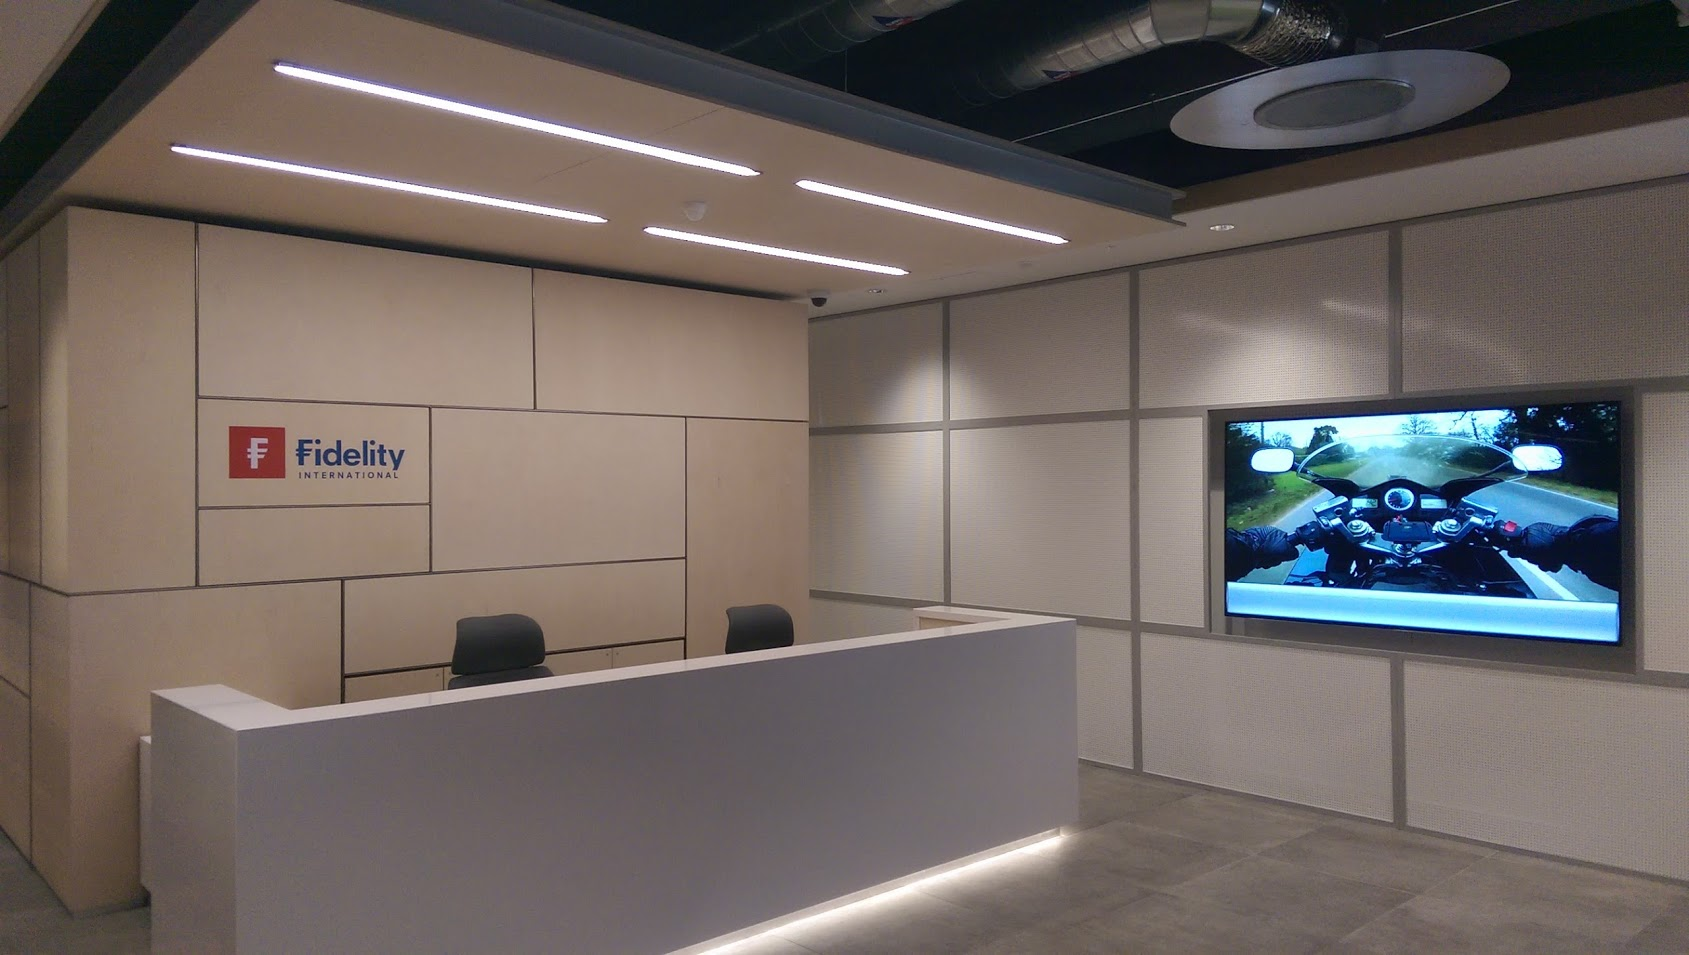 Fidelity Investments#Ireland